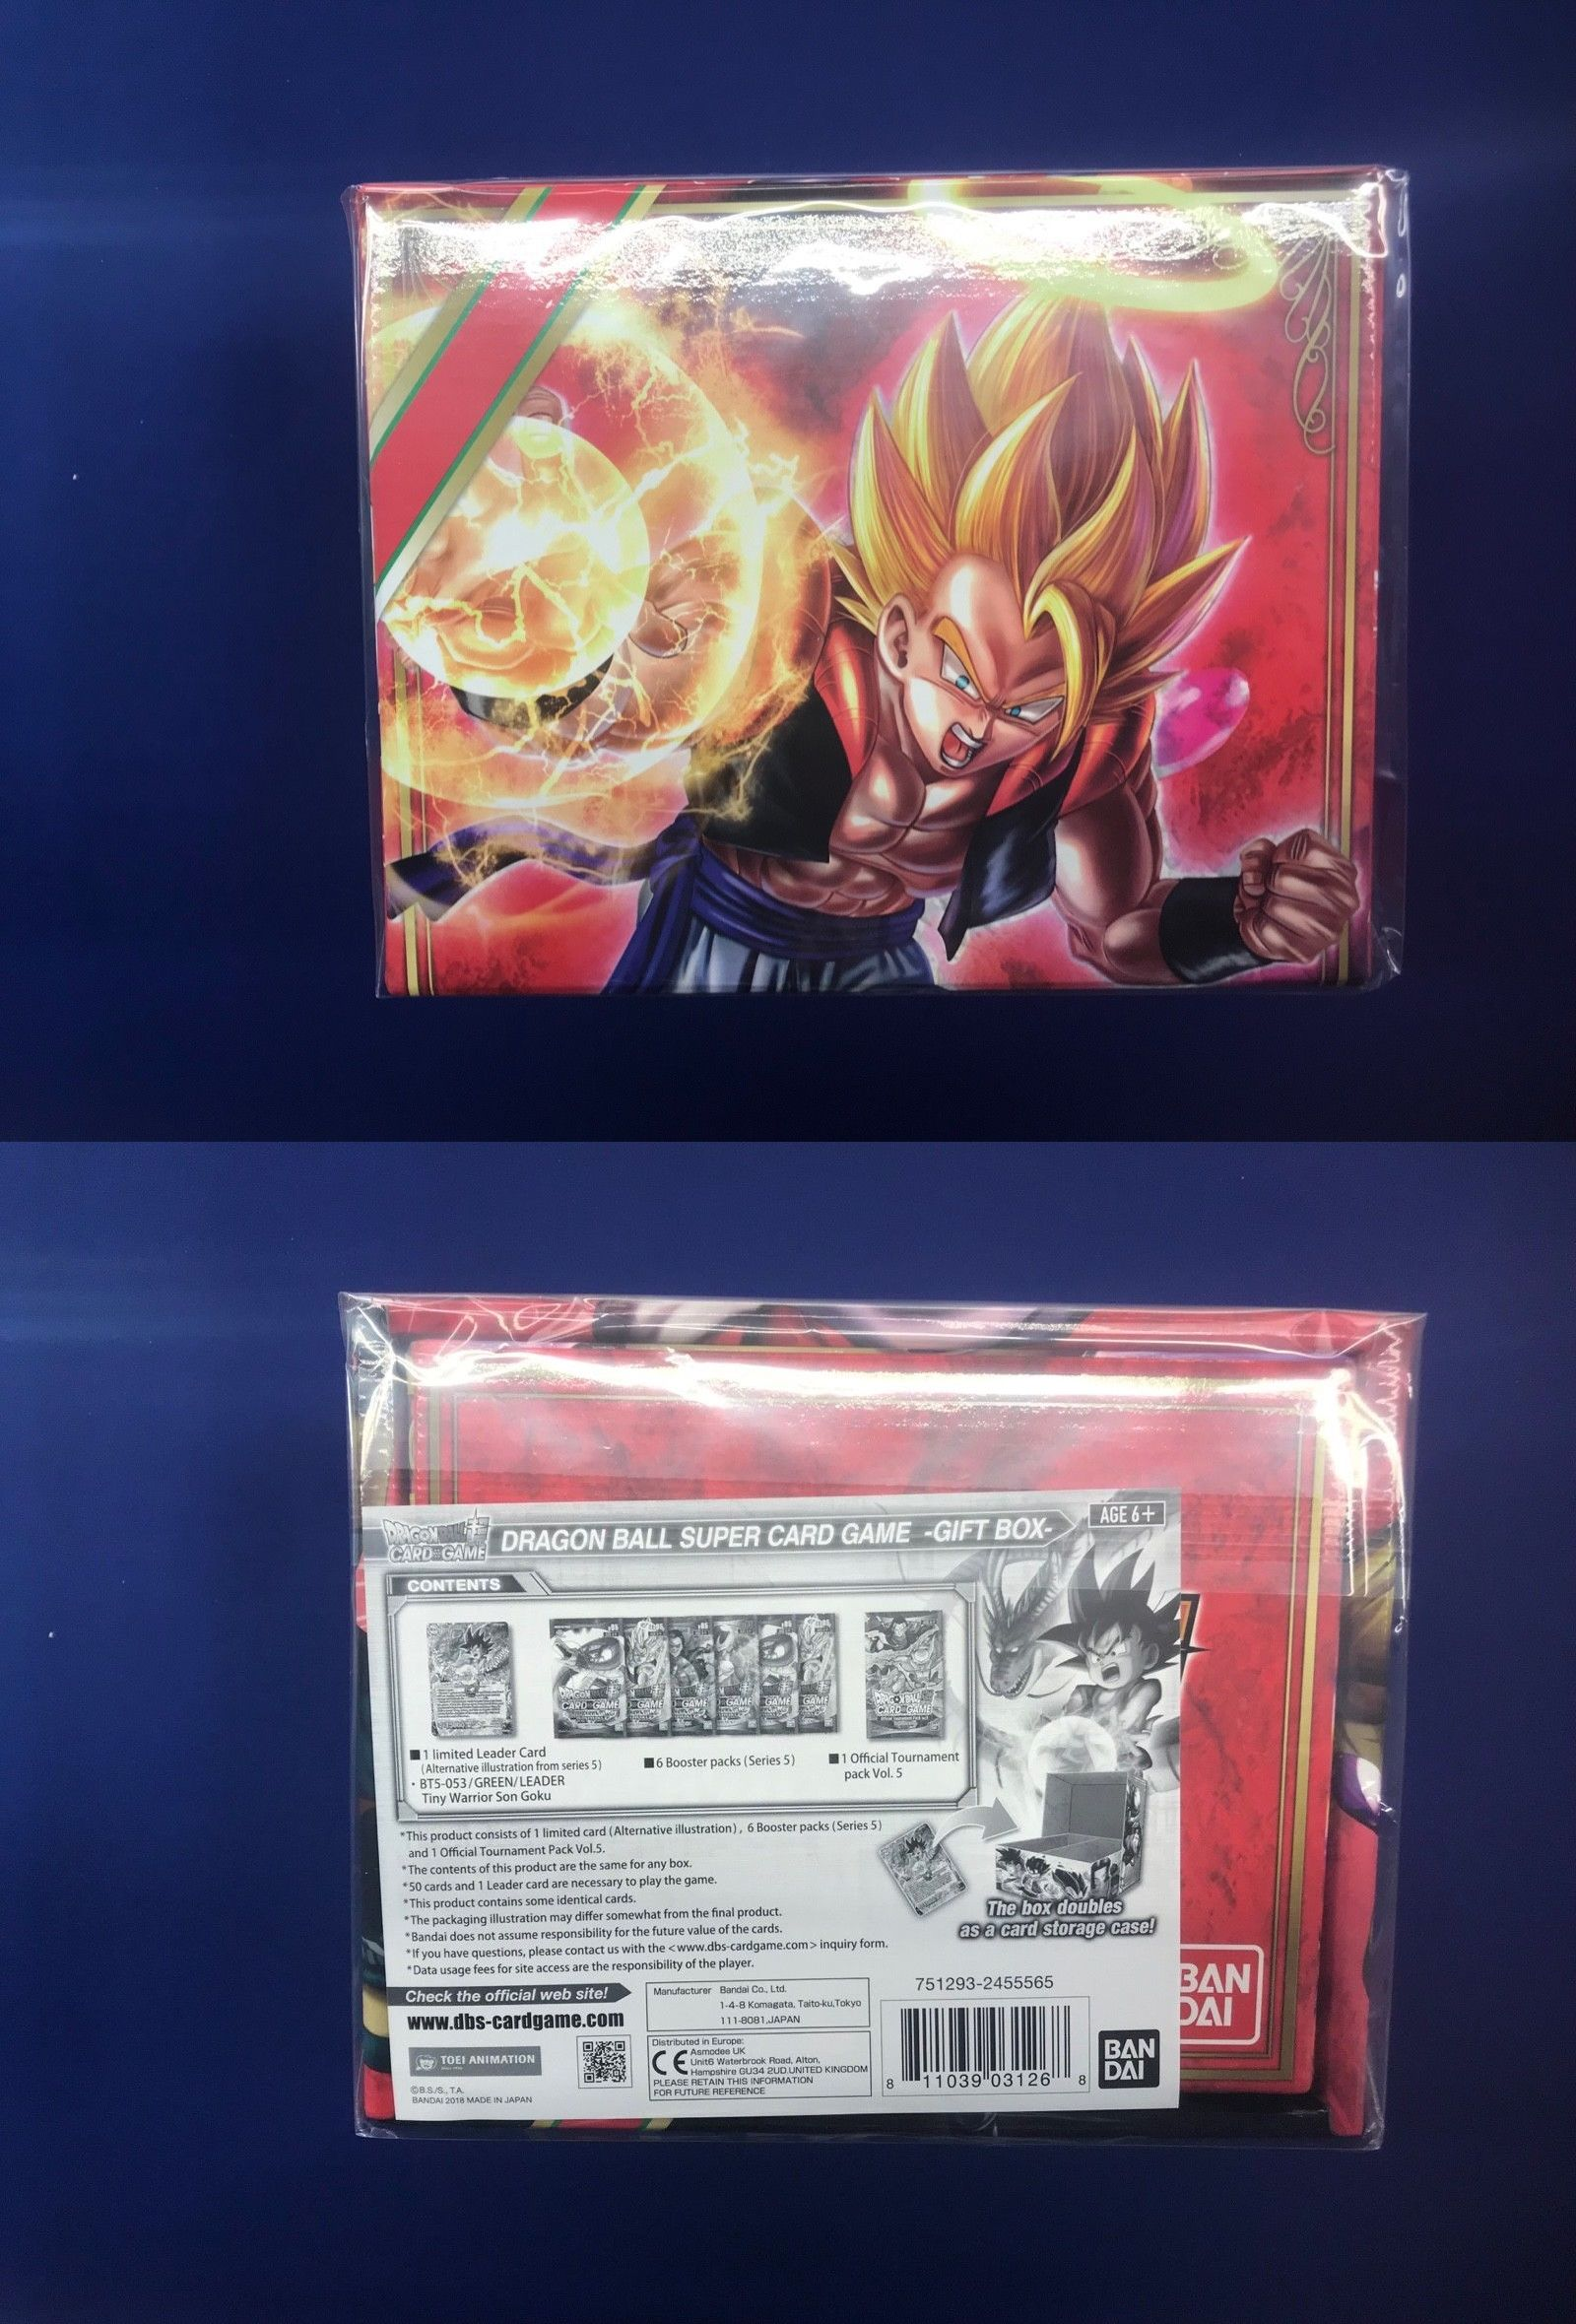 Dragon Ball Super Card Game Coffret /'Gift Box/' Noel 2018 Version Française !